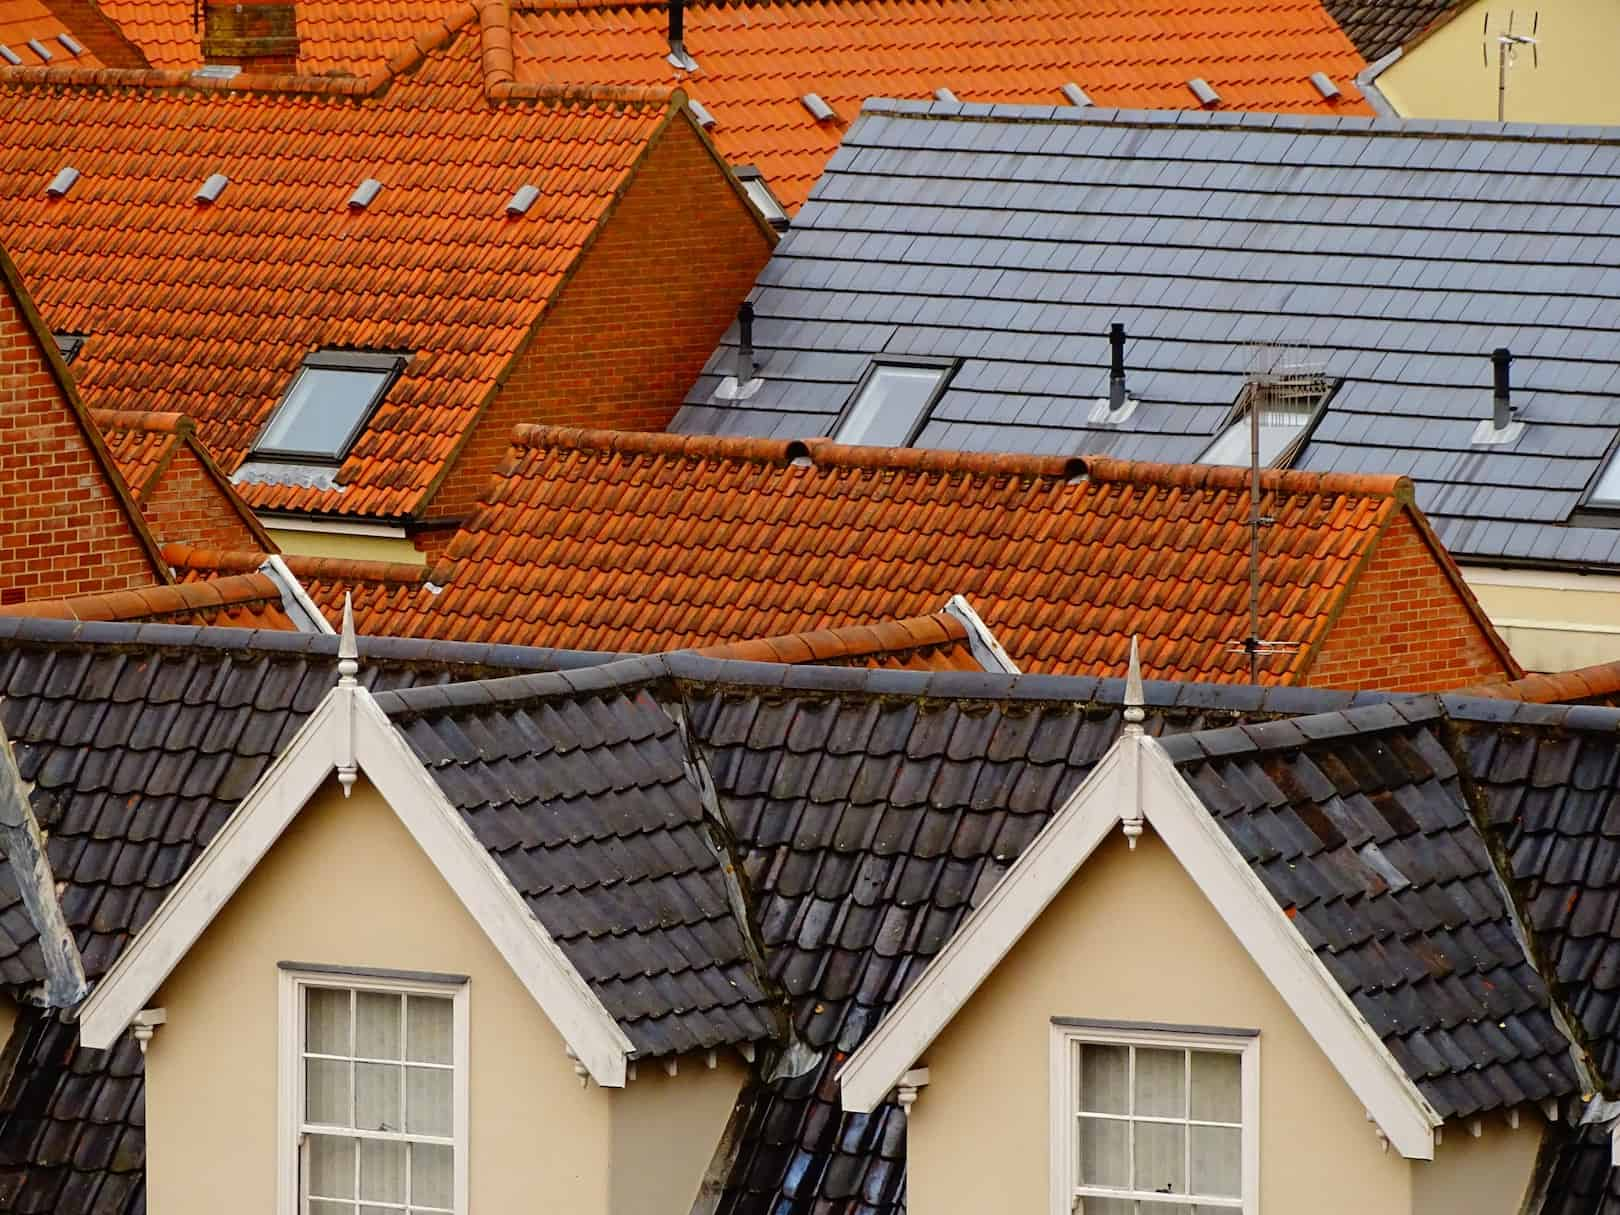 Tulsa Roofing materials